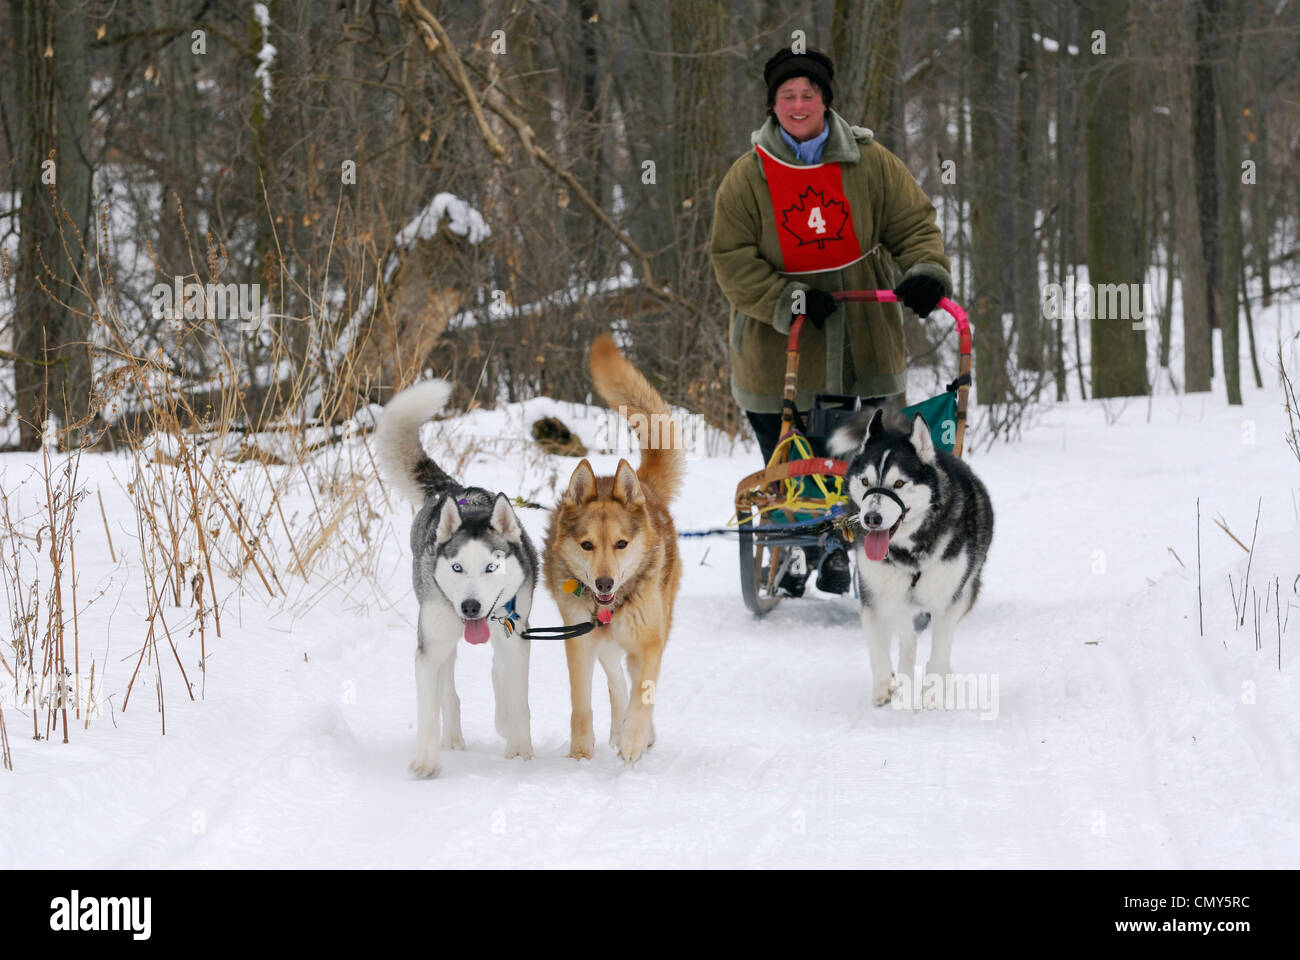 Hembra perro recreativas sleder mushing con nieve pista forestal en Canadá Imagen De Stock